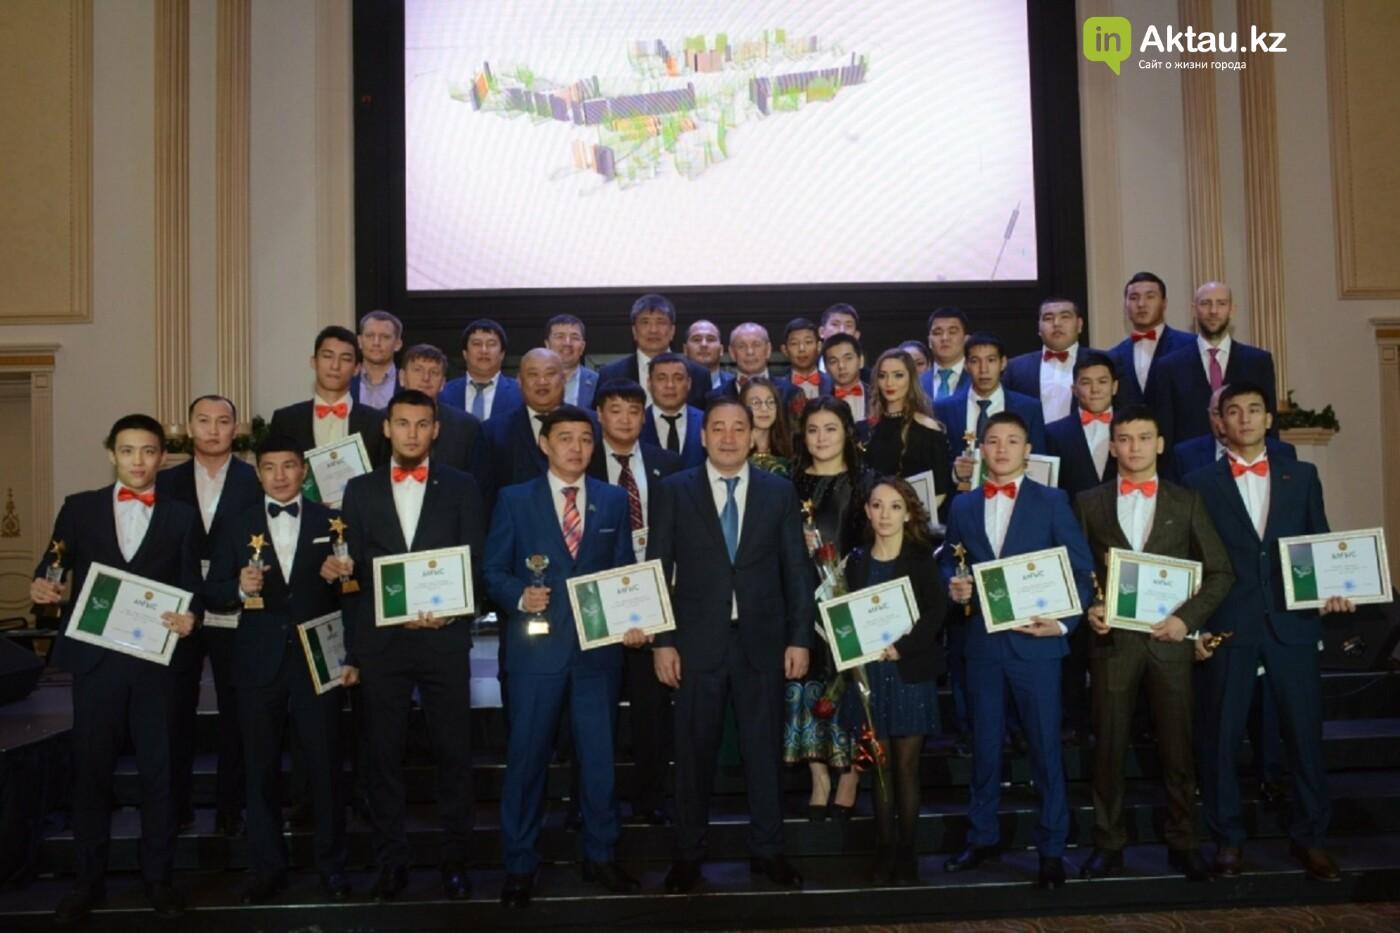 Награды за вклад в развитие спорта получили более 70 мангистаусцев, фото-3